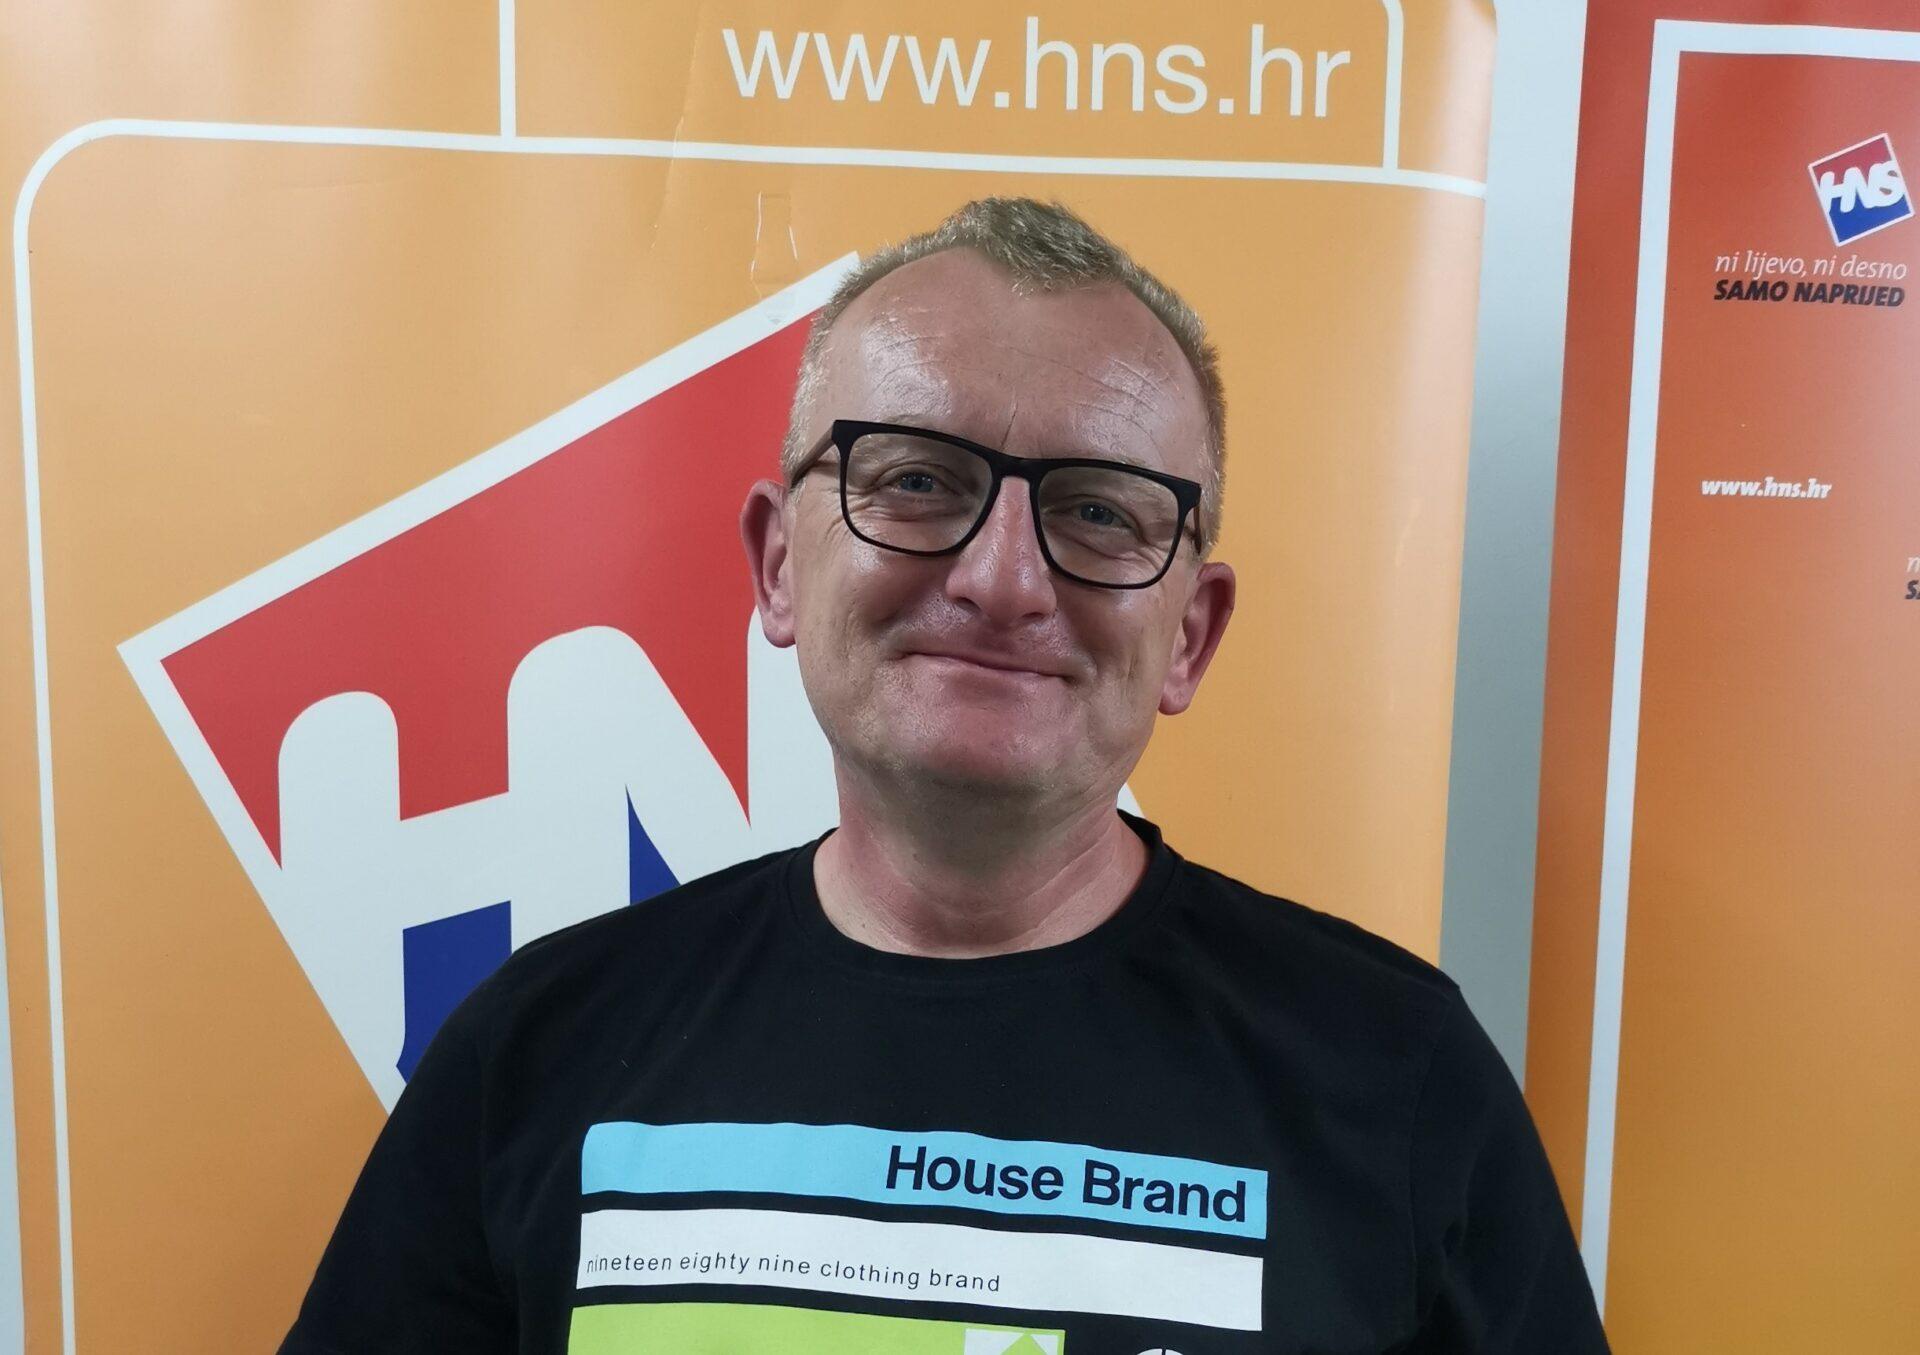 Osnovana podružnica HNS-a Marija Bistrica